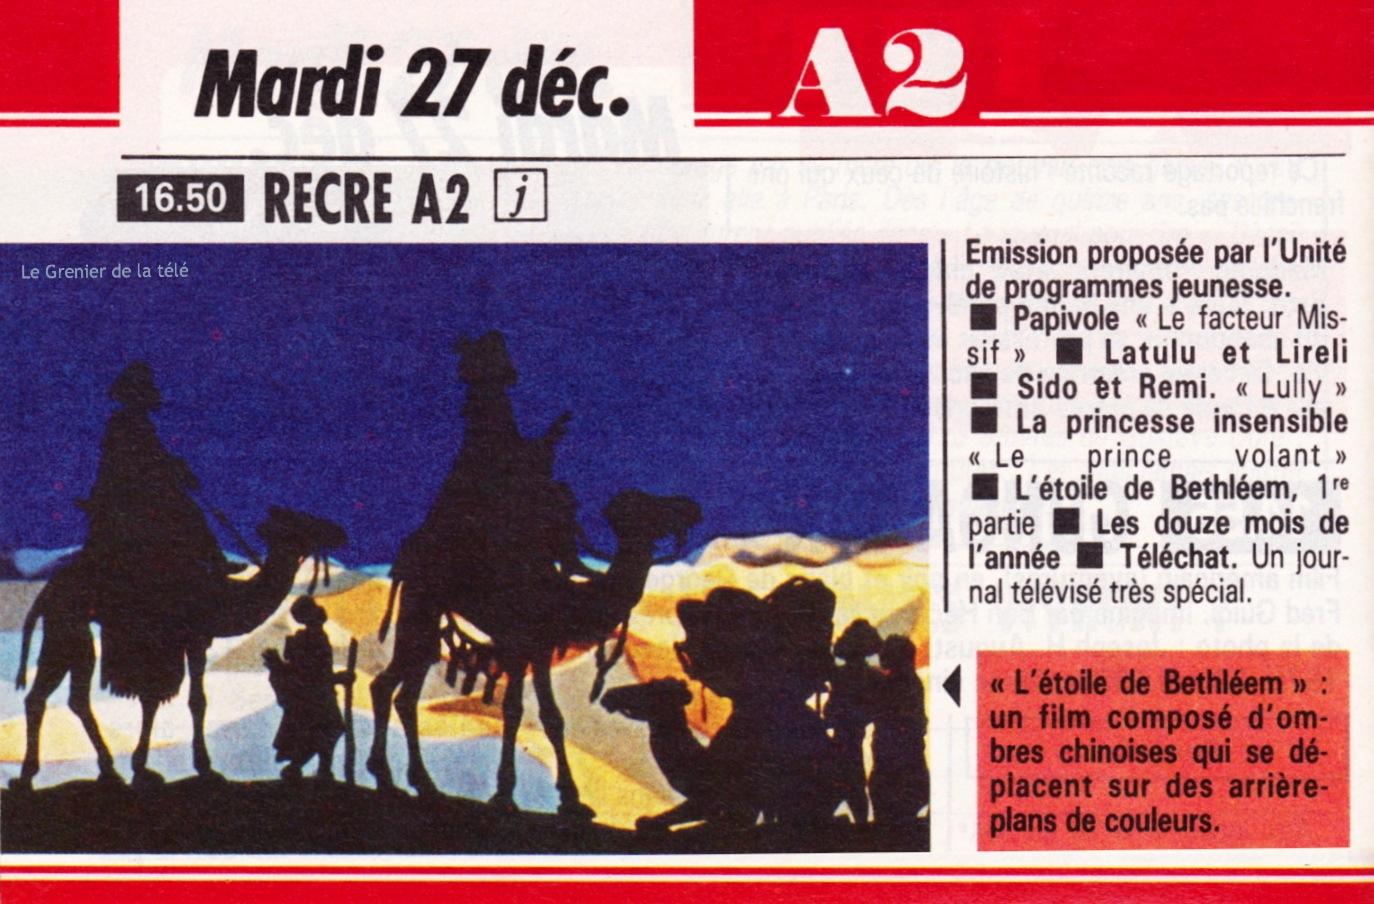 http://grenierdelatv.free.fr/recrea227decembre1983.jpg